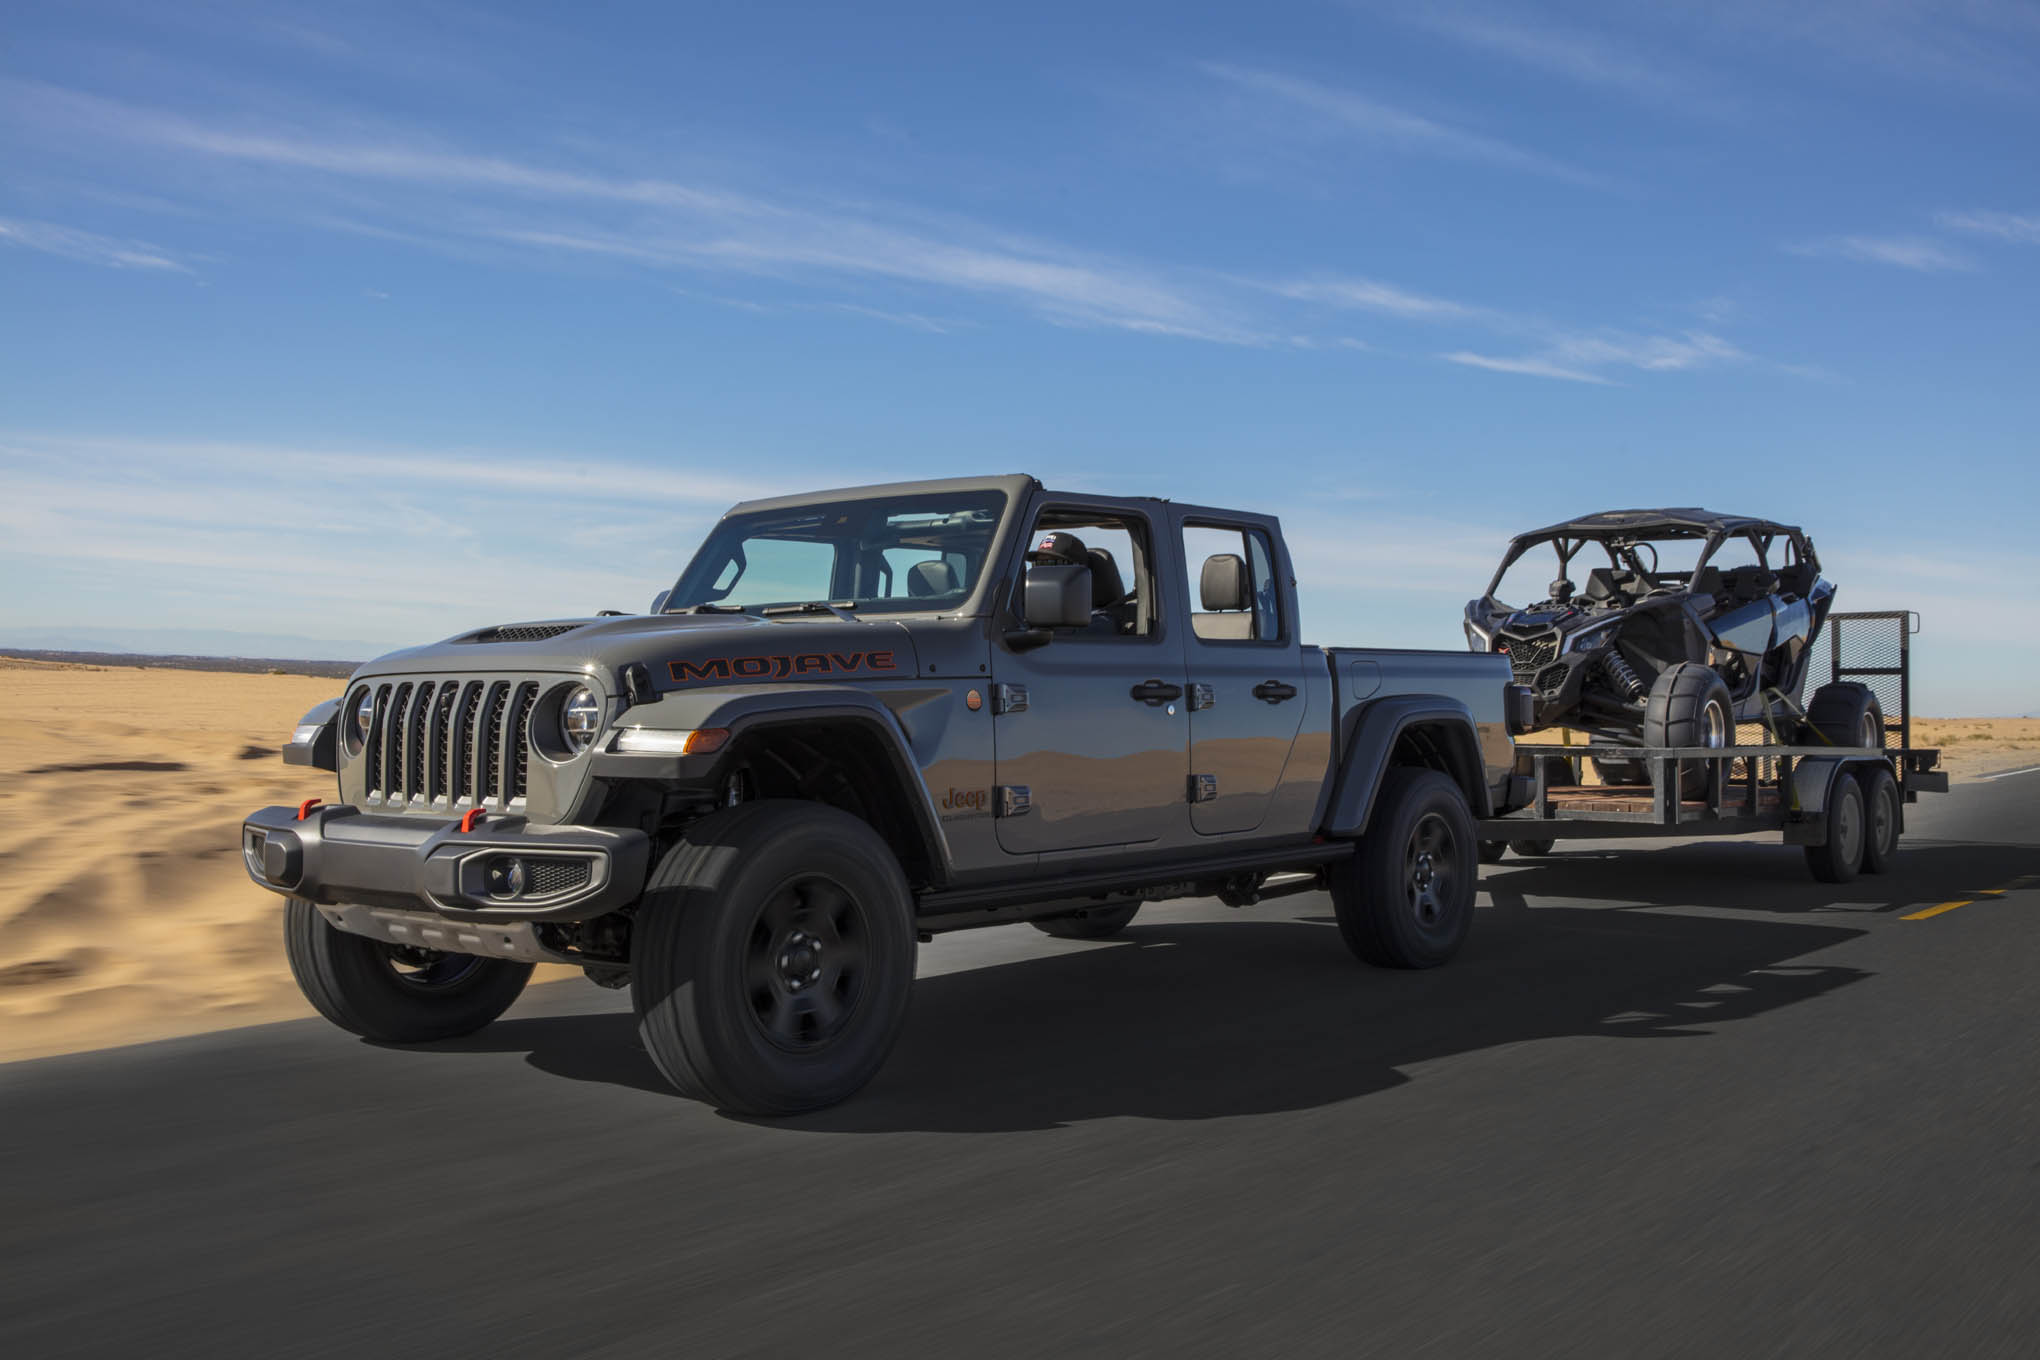 2020 jeep gladiator mojave compared with gladiator rubicon